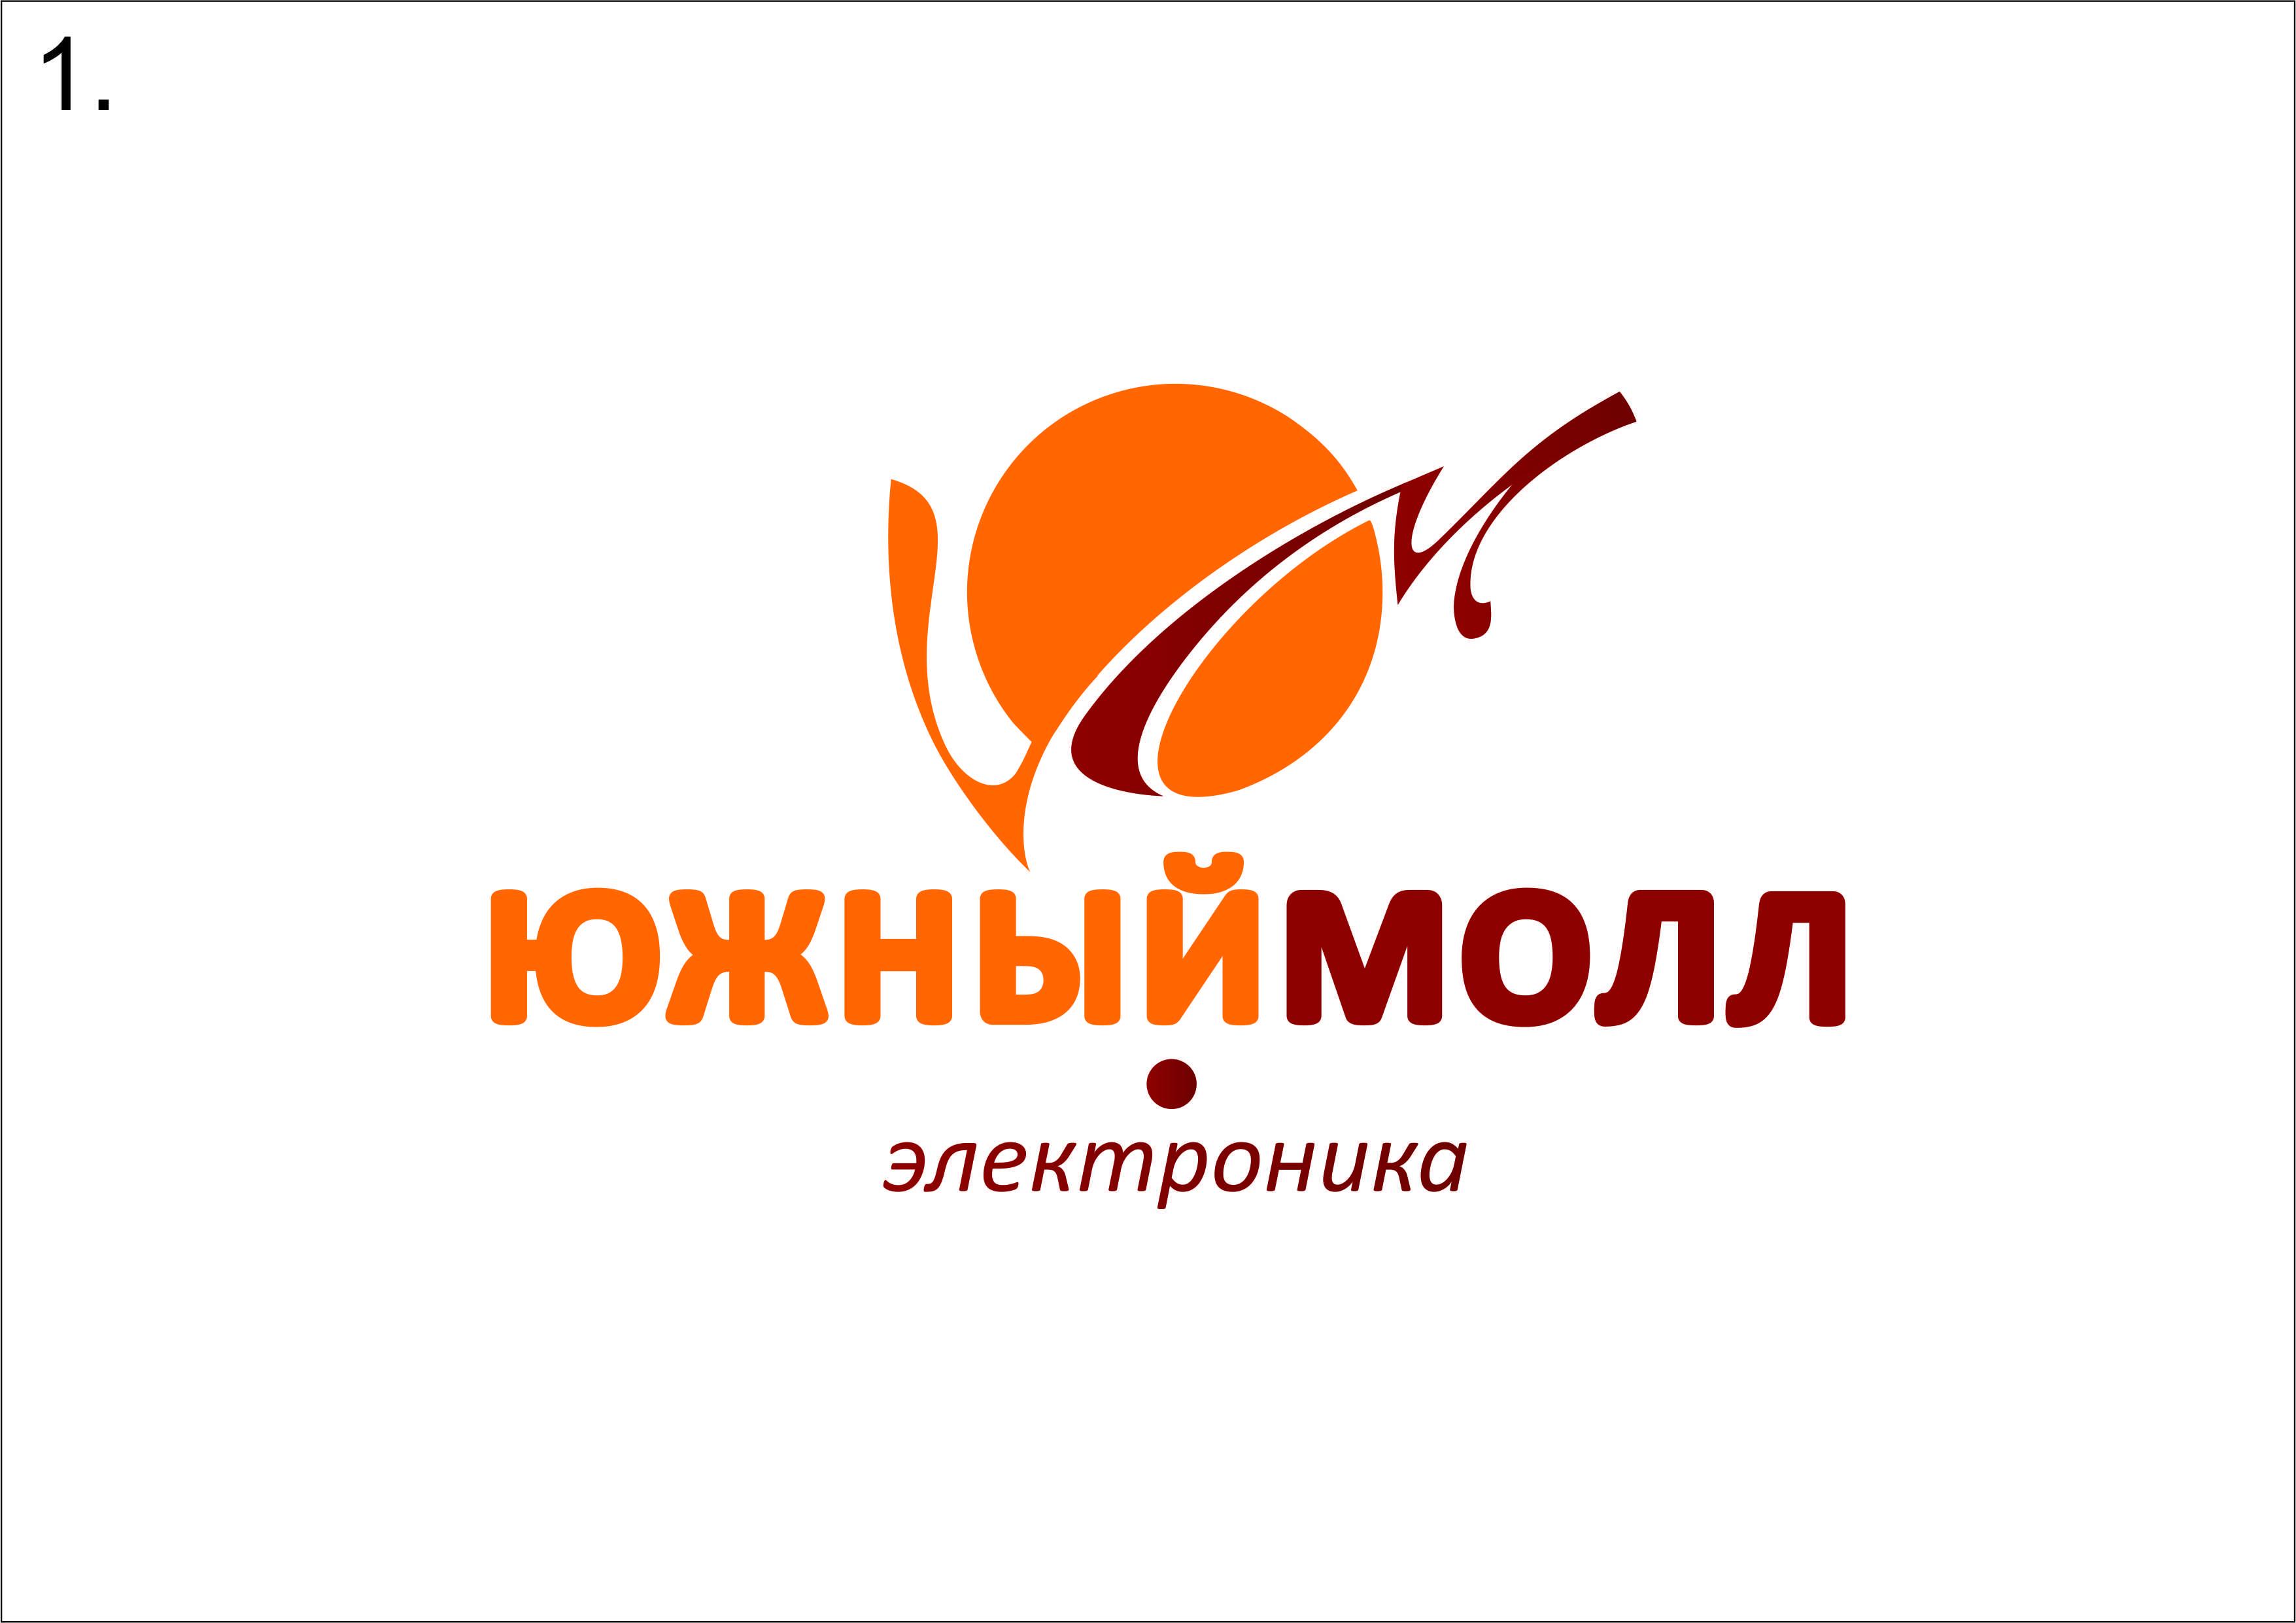 Разработка логотипа фото f_4db4c9d35d838.jpg